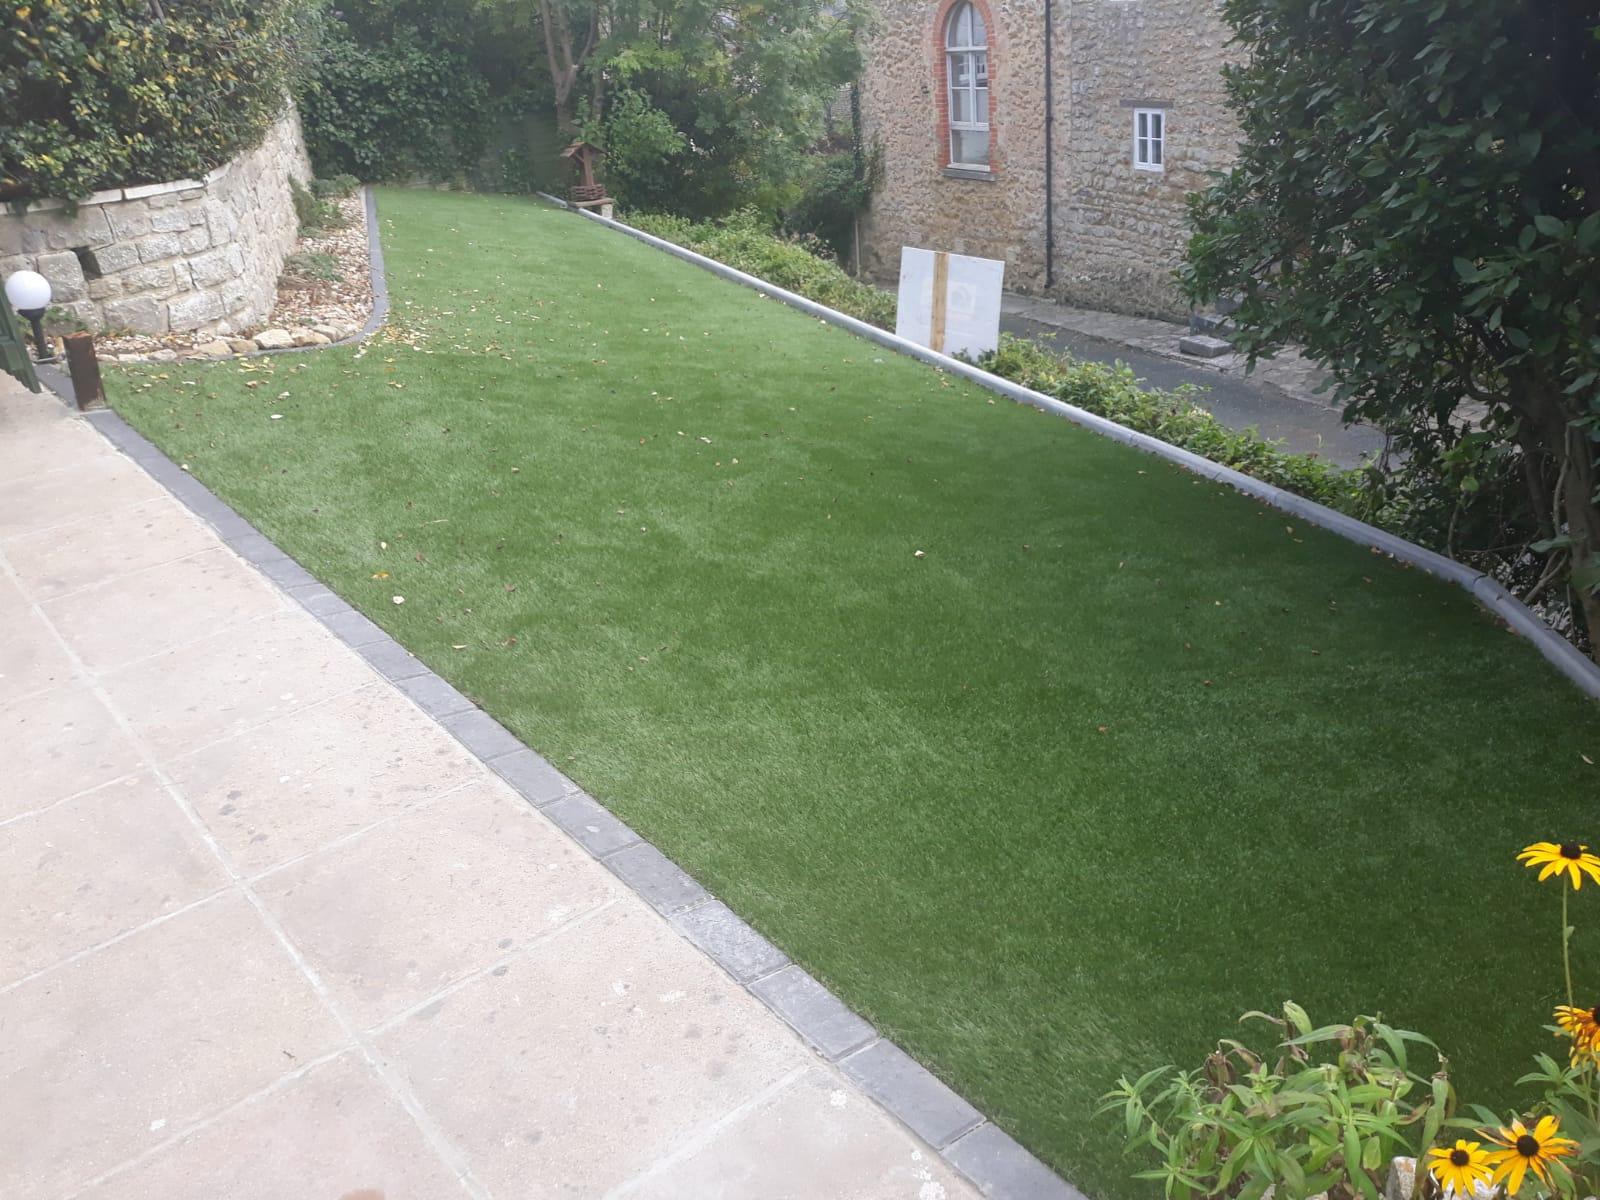 ARTIFICIAL GRASS - MEADOW